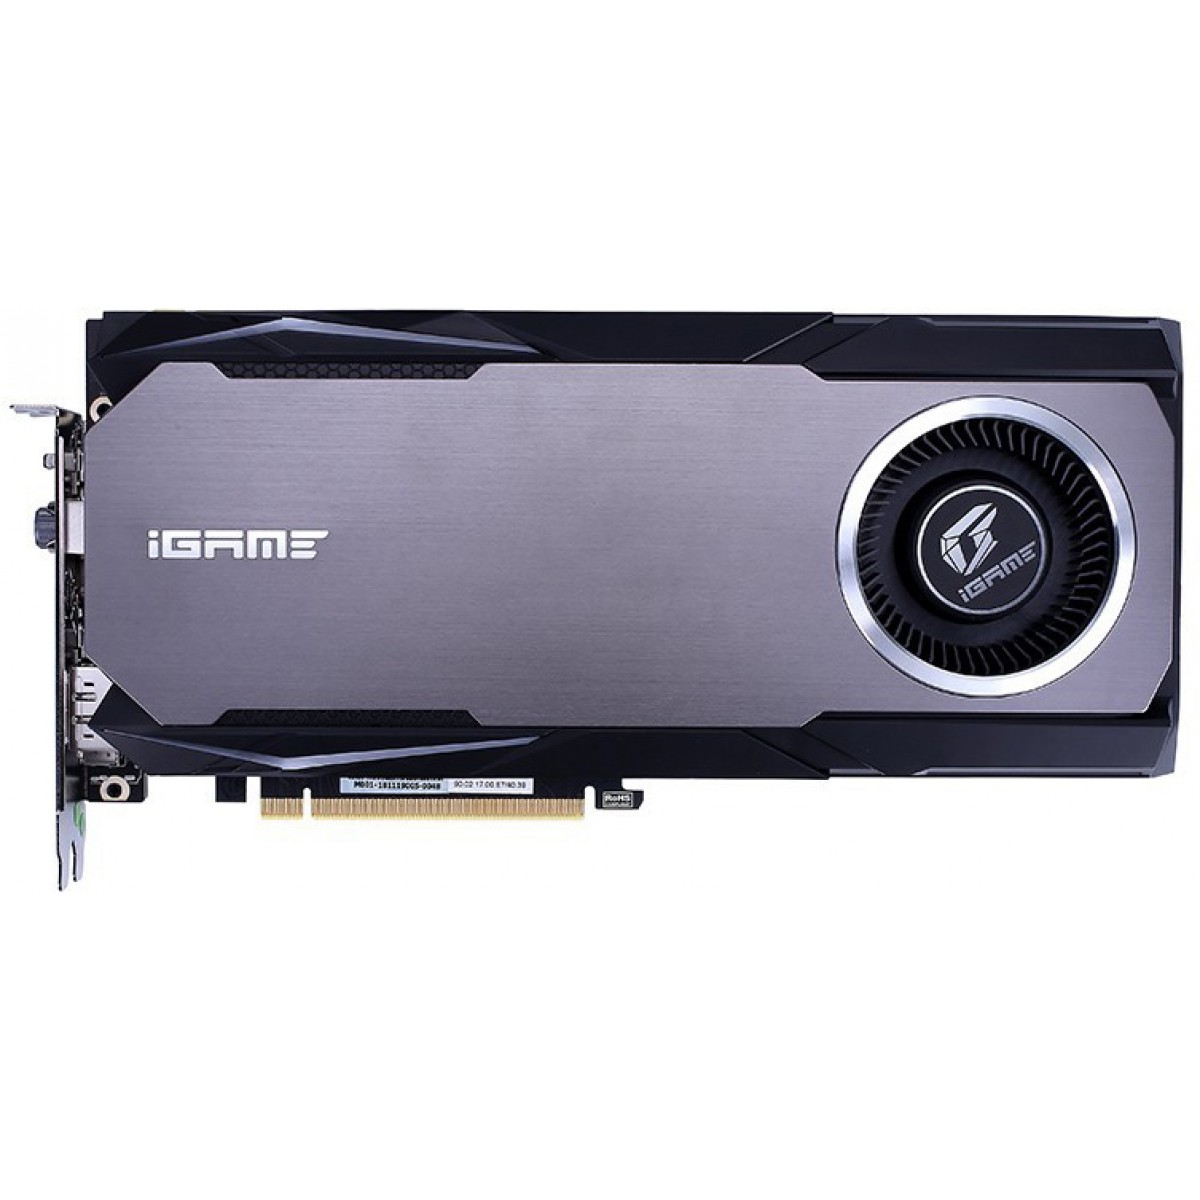 Placa de Vídeo Colorful iGame Geforce RTX 2080 Ti Neptune OC-V, 11GB GDDR6, 352Bit